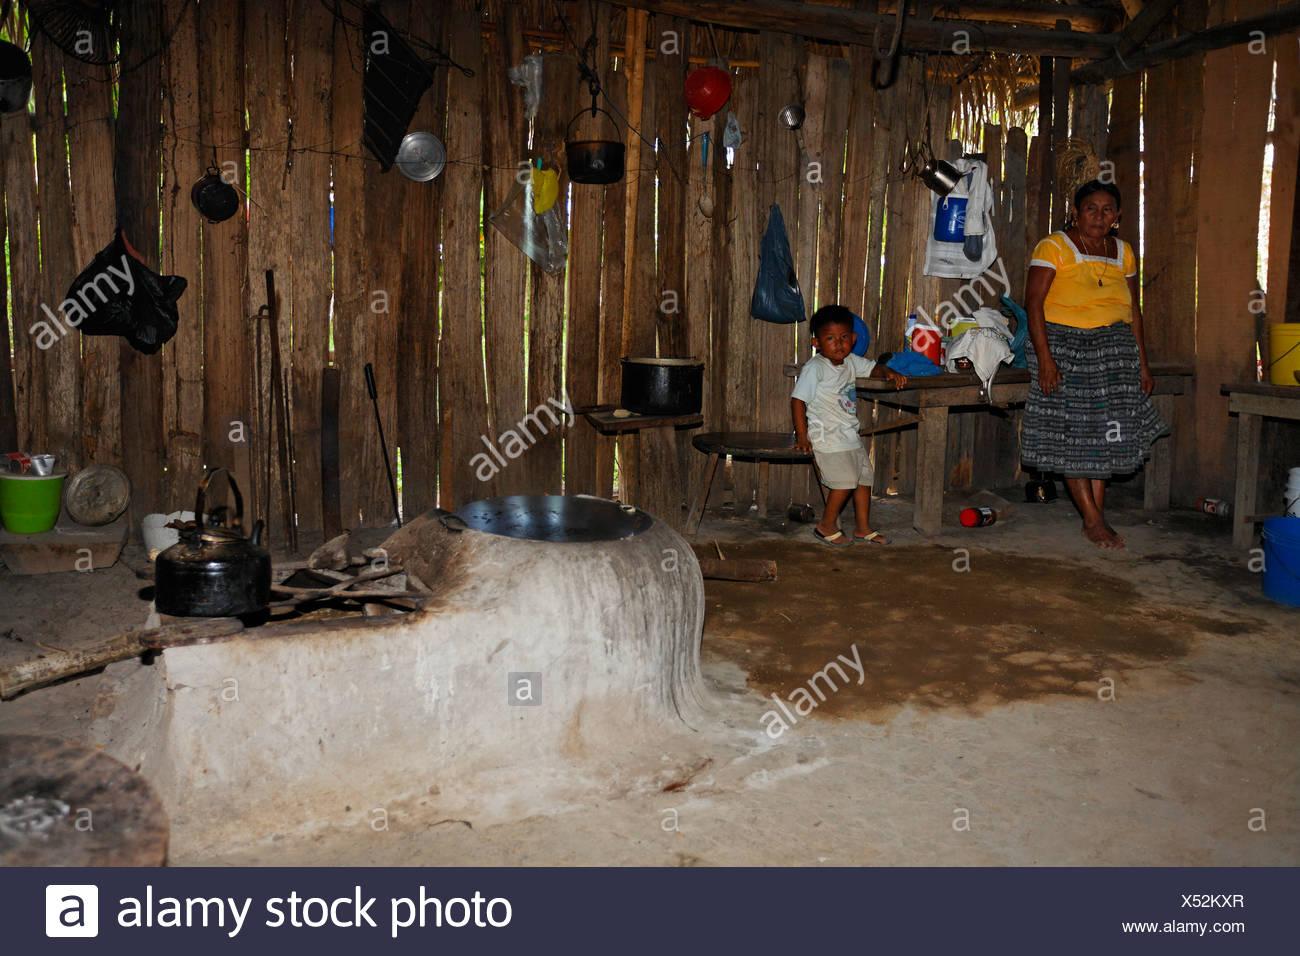 One-room flat, Mayan woman, small boy, fireplace, kitchen utensils, water boiler, Punta Gorda, Belize, Central America - Stock Image